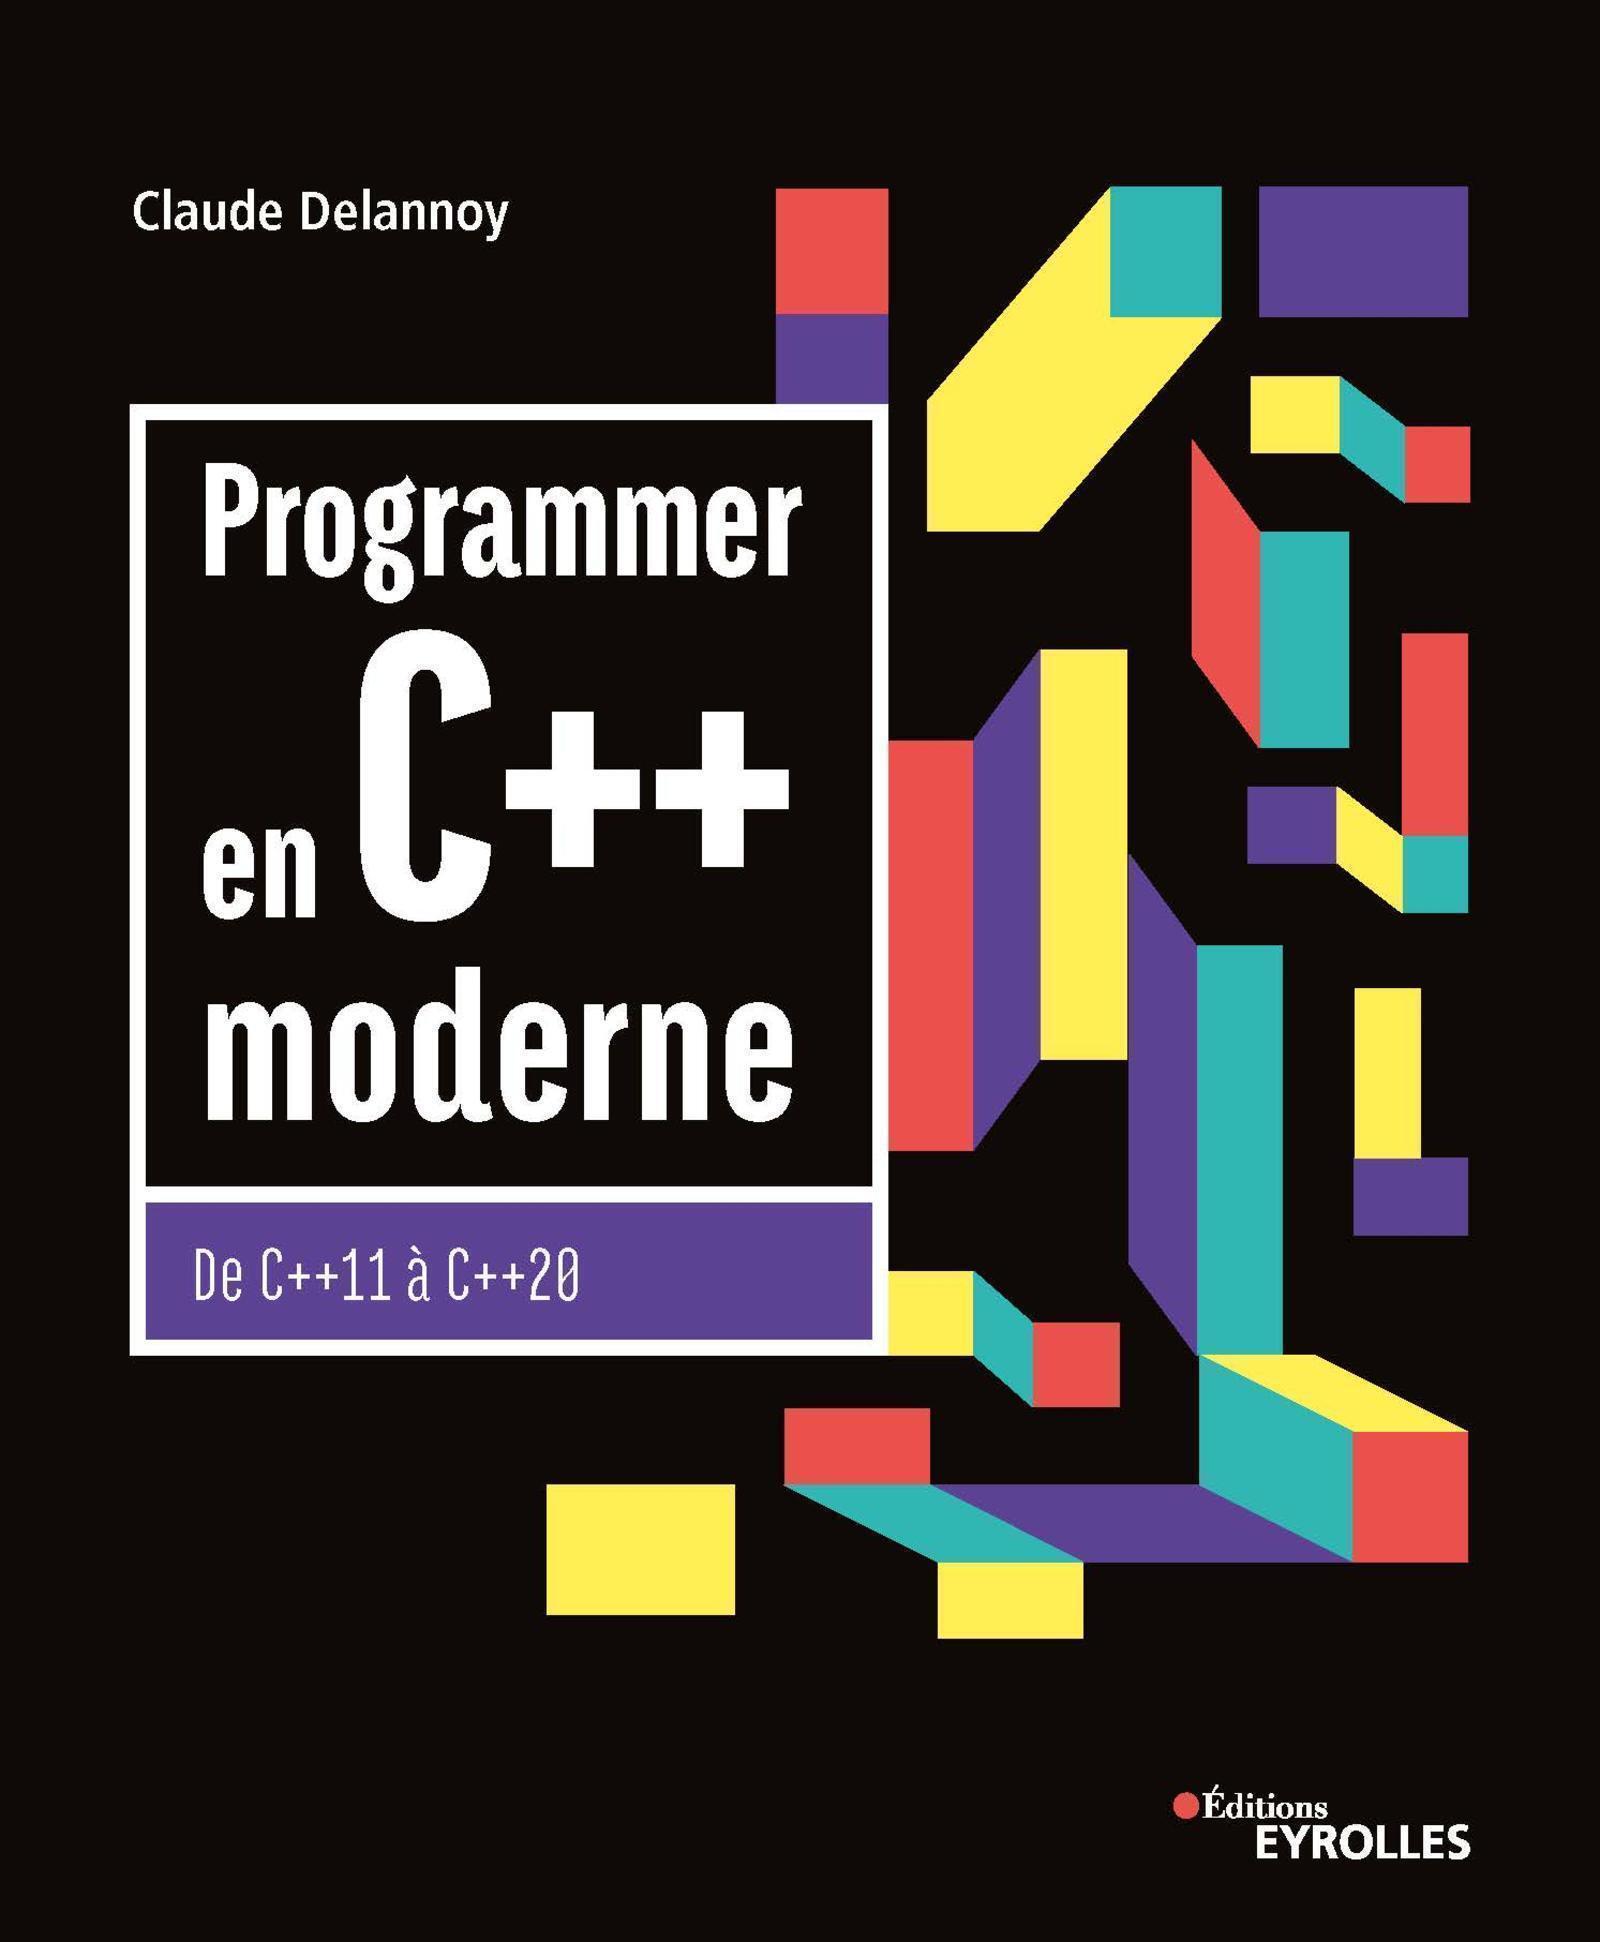 PROGRAMMER EN C++ MODERNE - DE C++11 A C++20